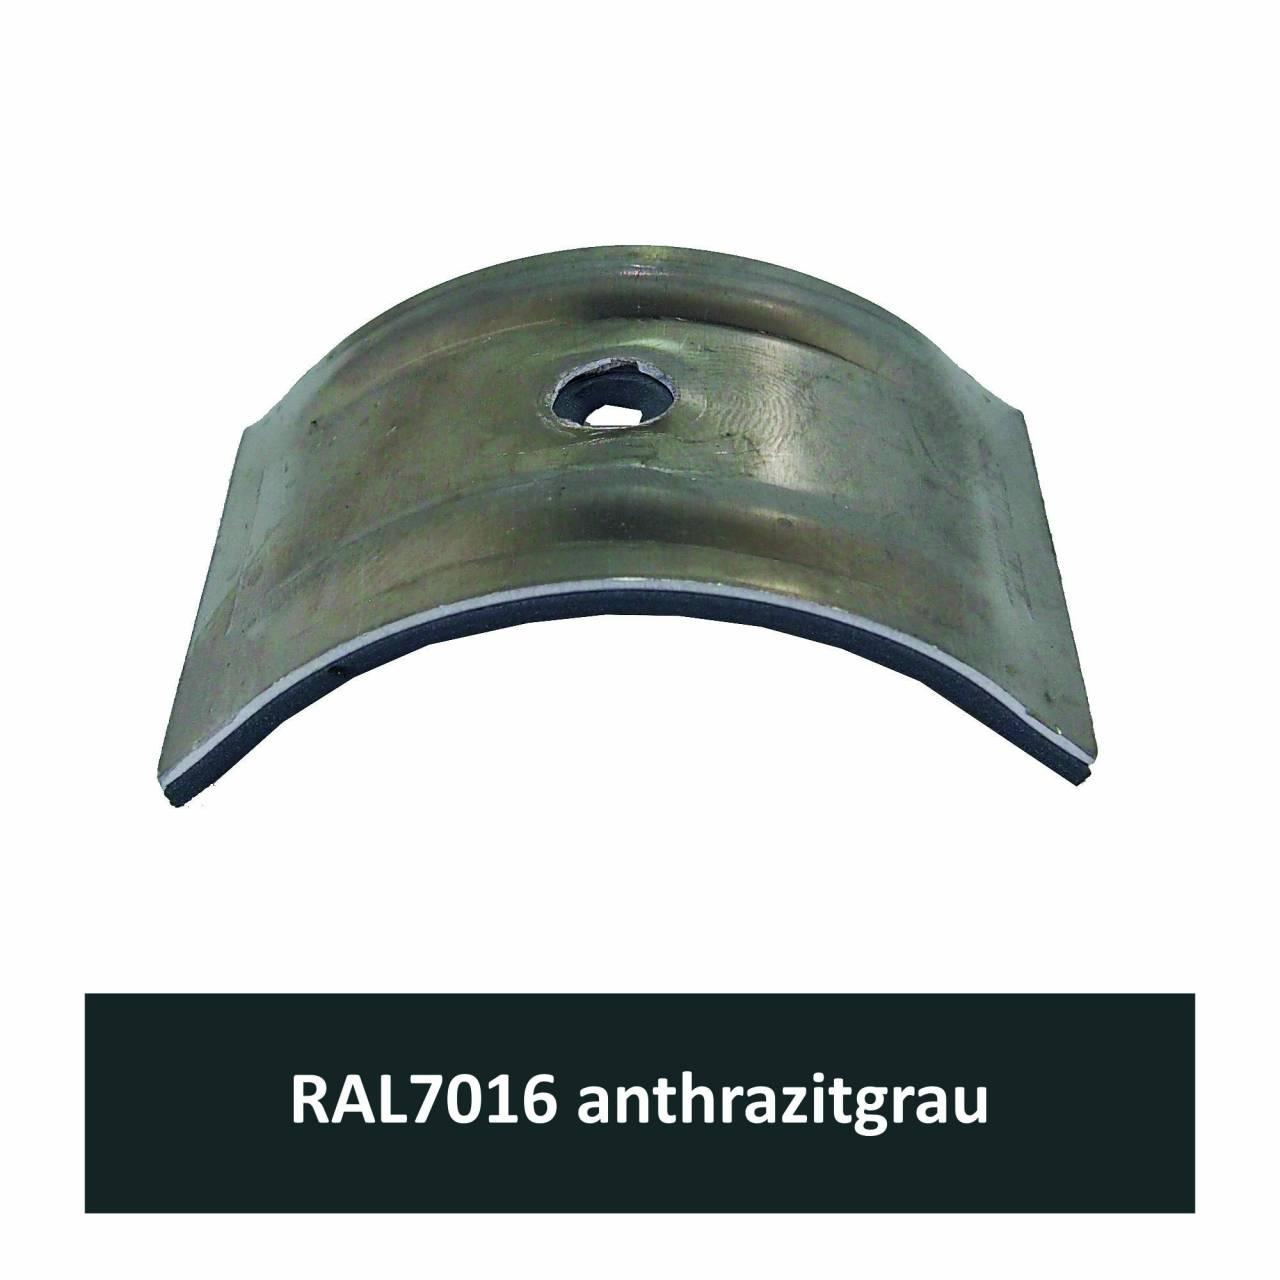 Kalotten für Welle 150/50, Alu RAL7016 anthrazitgrau / Pck a 100 Stück